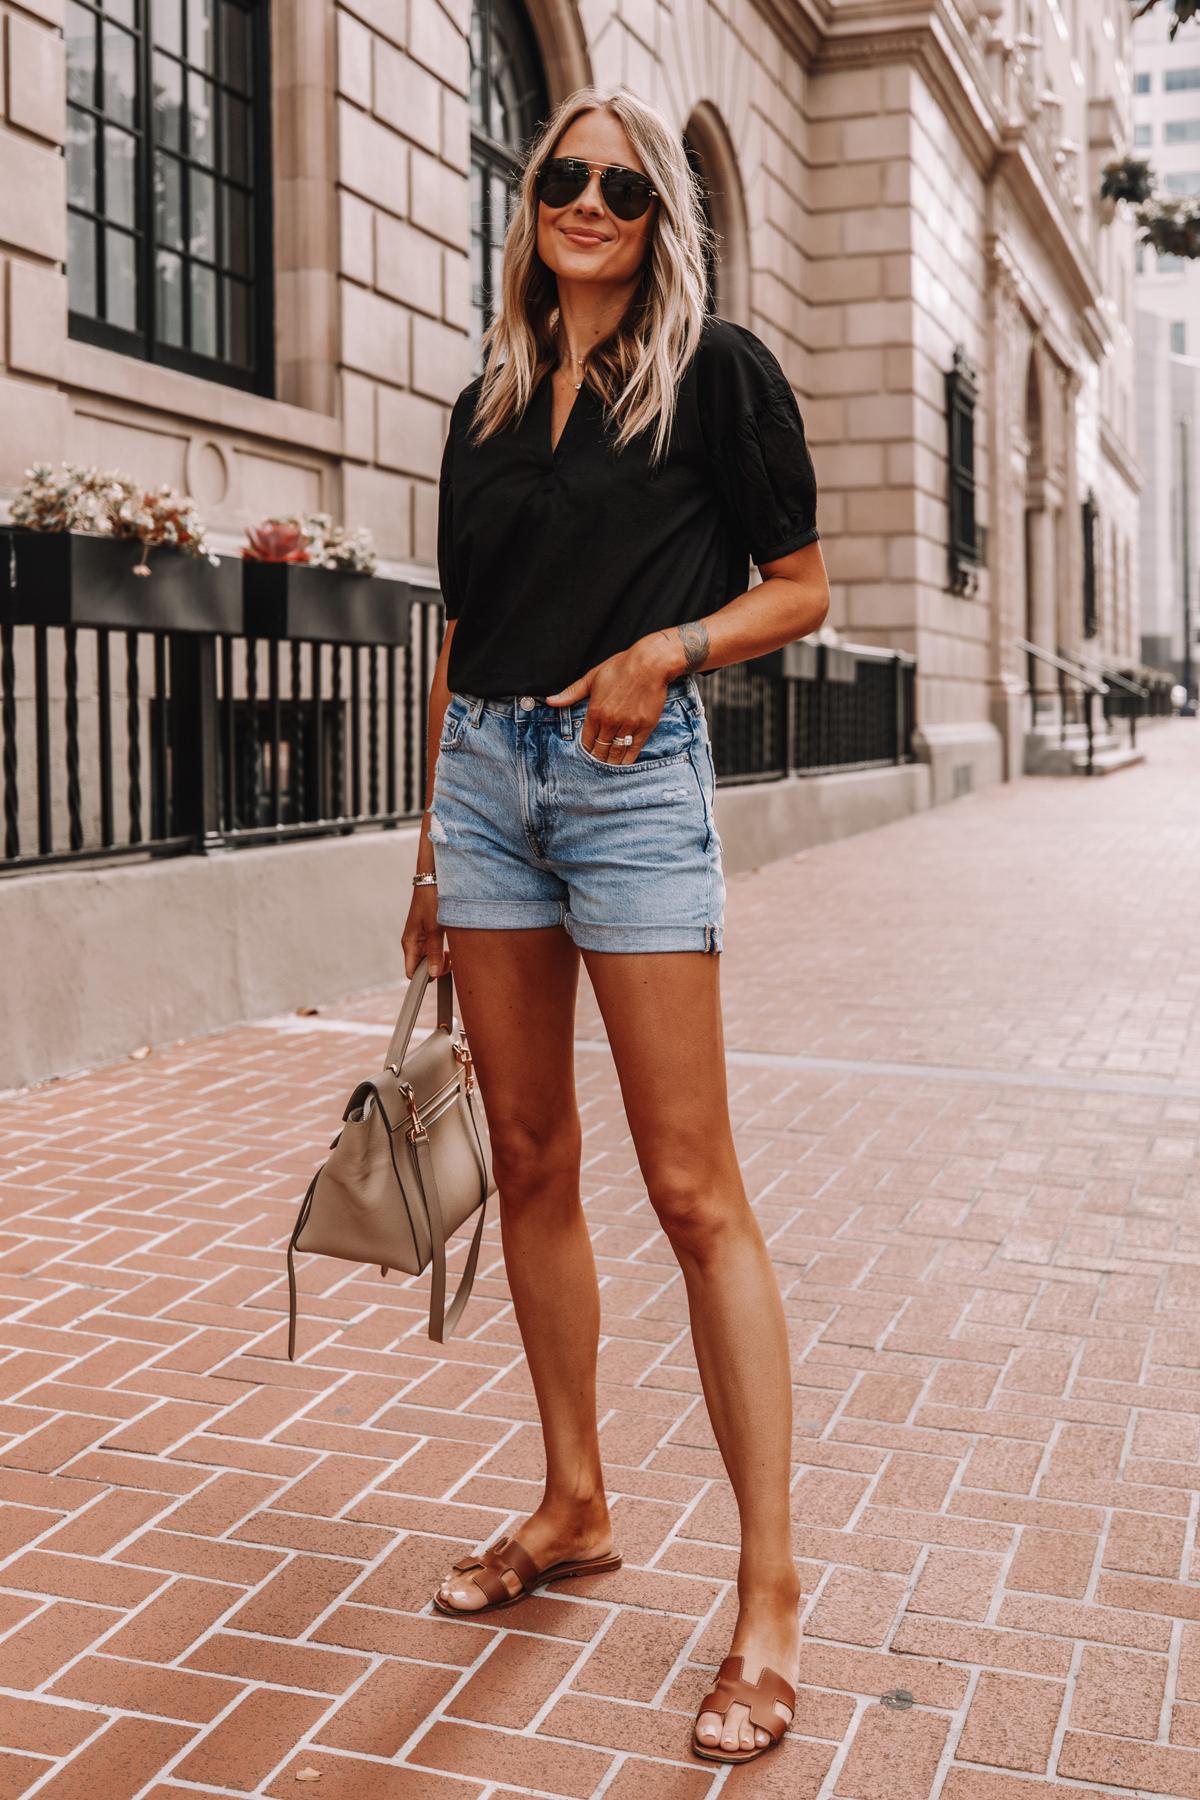 Fashion Jackson Wearing Black Everlane Split Neck Puff Sleeve Air Shirt Everlane Denim Shorts Tan Sandals Summer Outfit 3